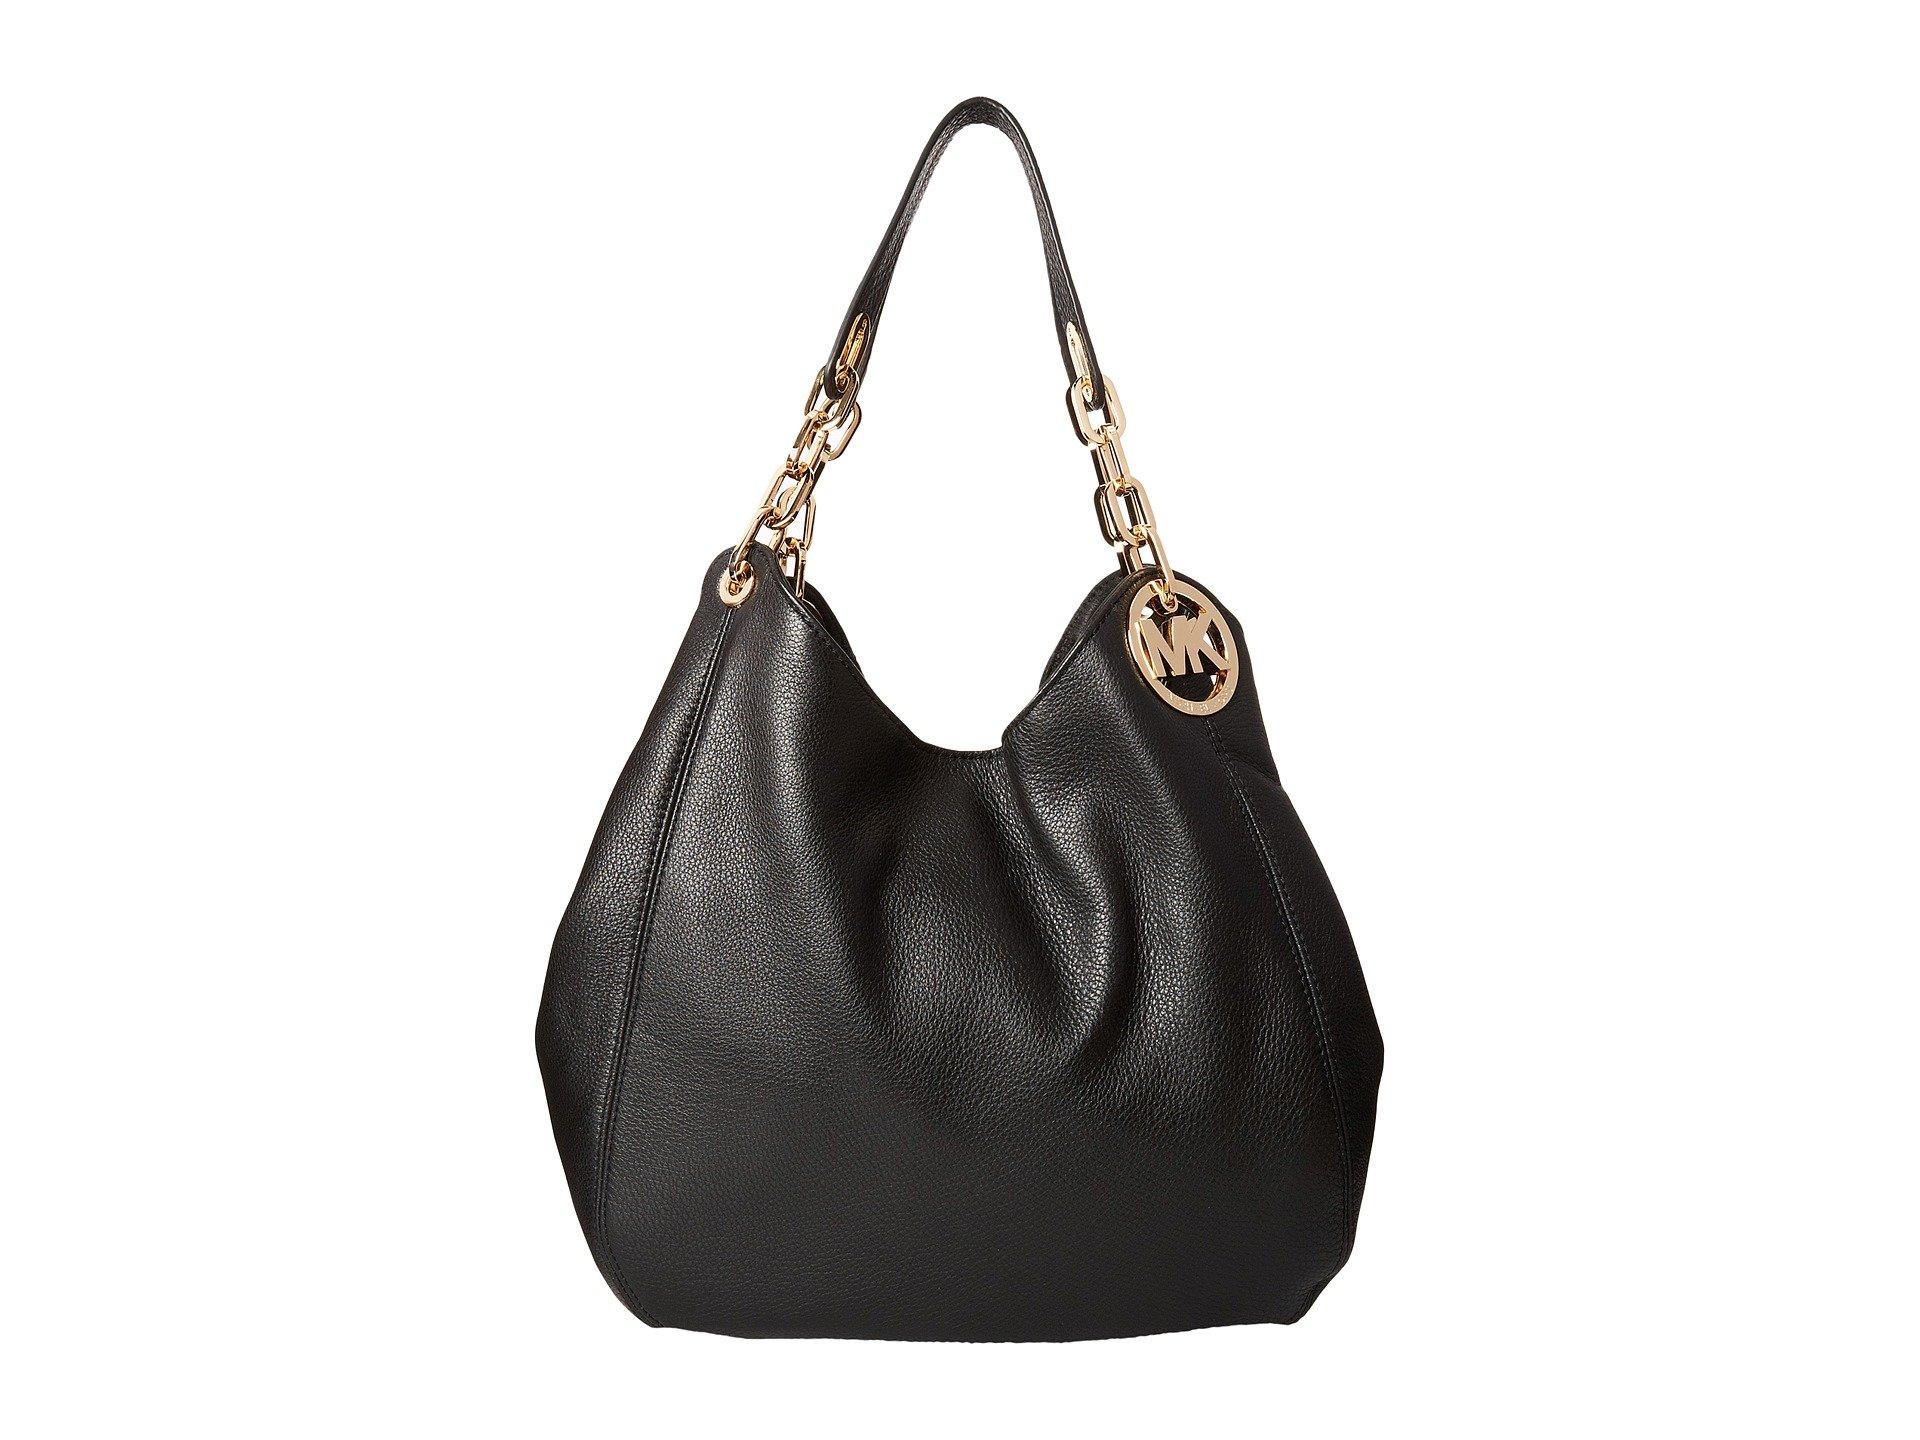 a3d70b690e4f07 Michael Kors Fulton Large Black Shoulder Tote Bags | Stanford Center ...